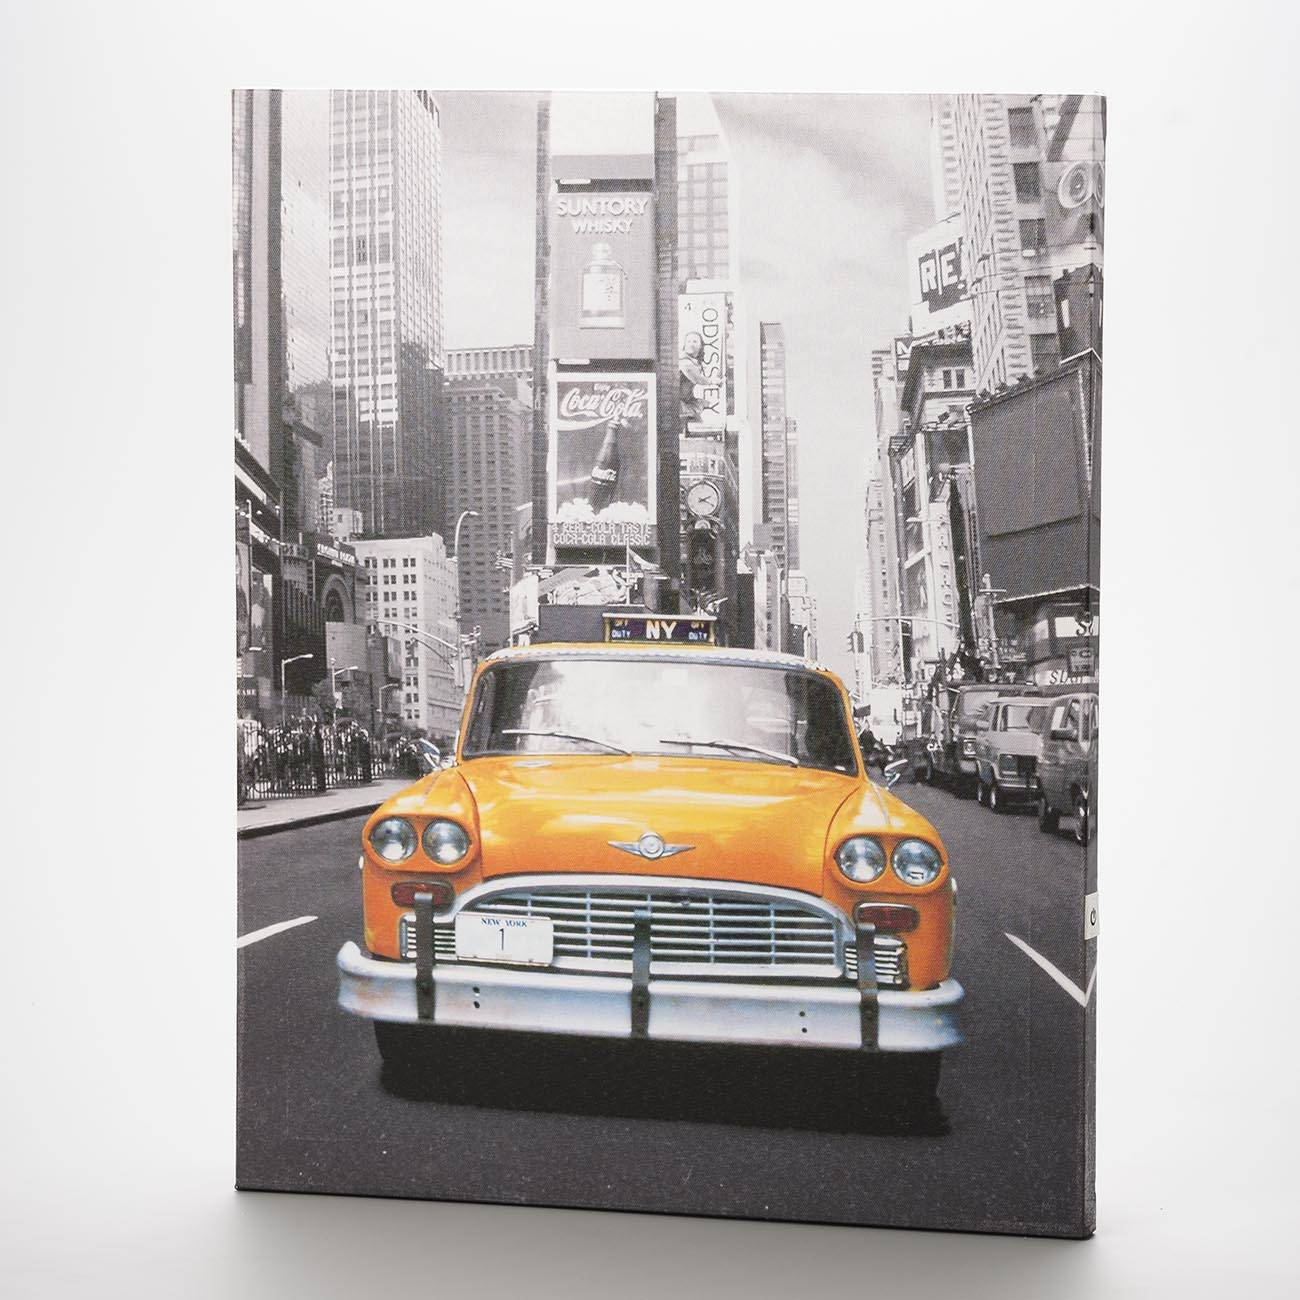 Tela Cadillac Laranja com Leds - Prestige - 40x50 cm